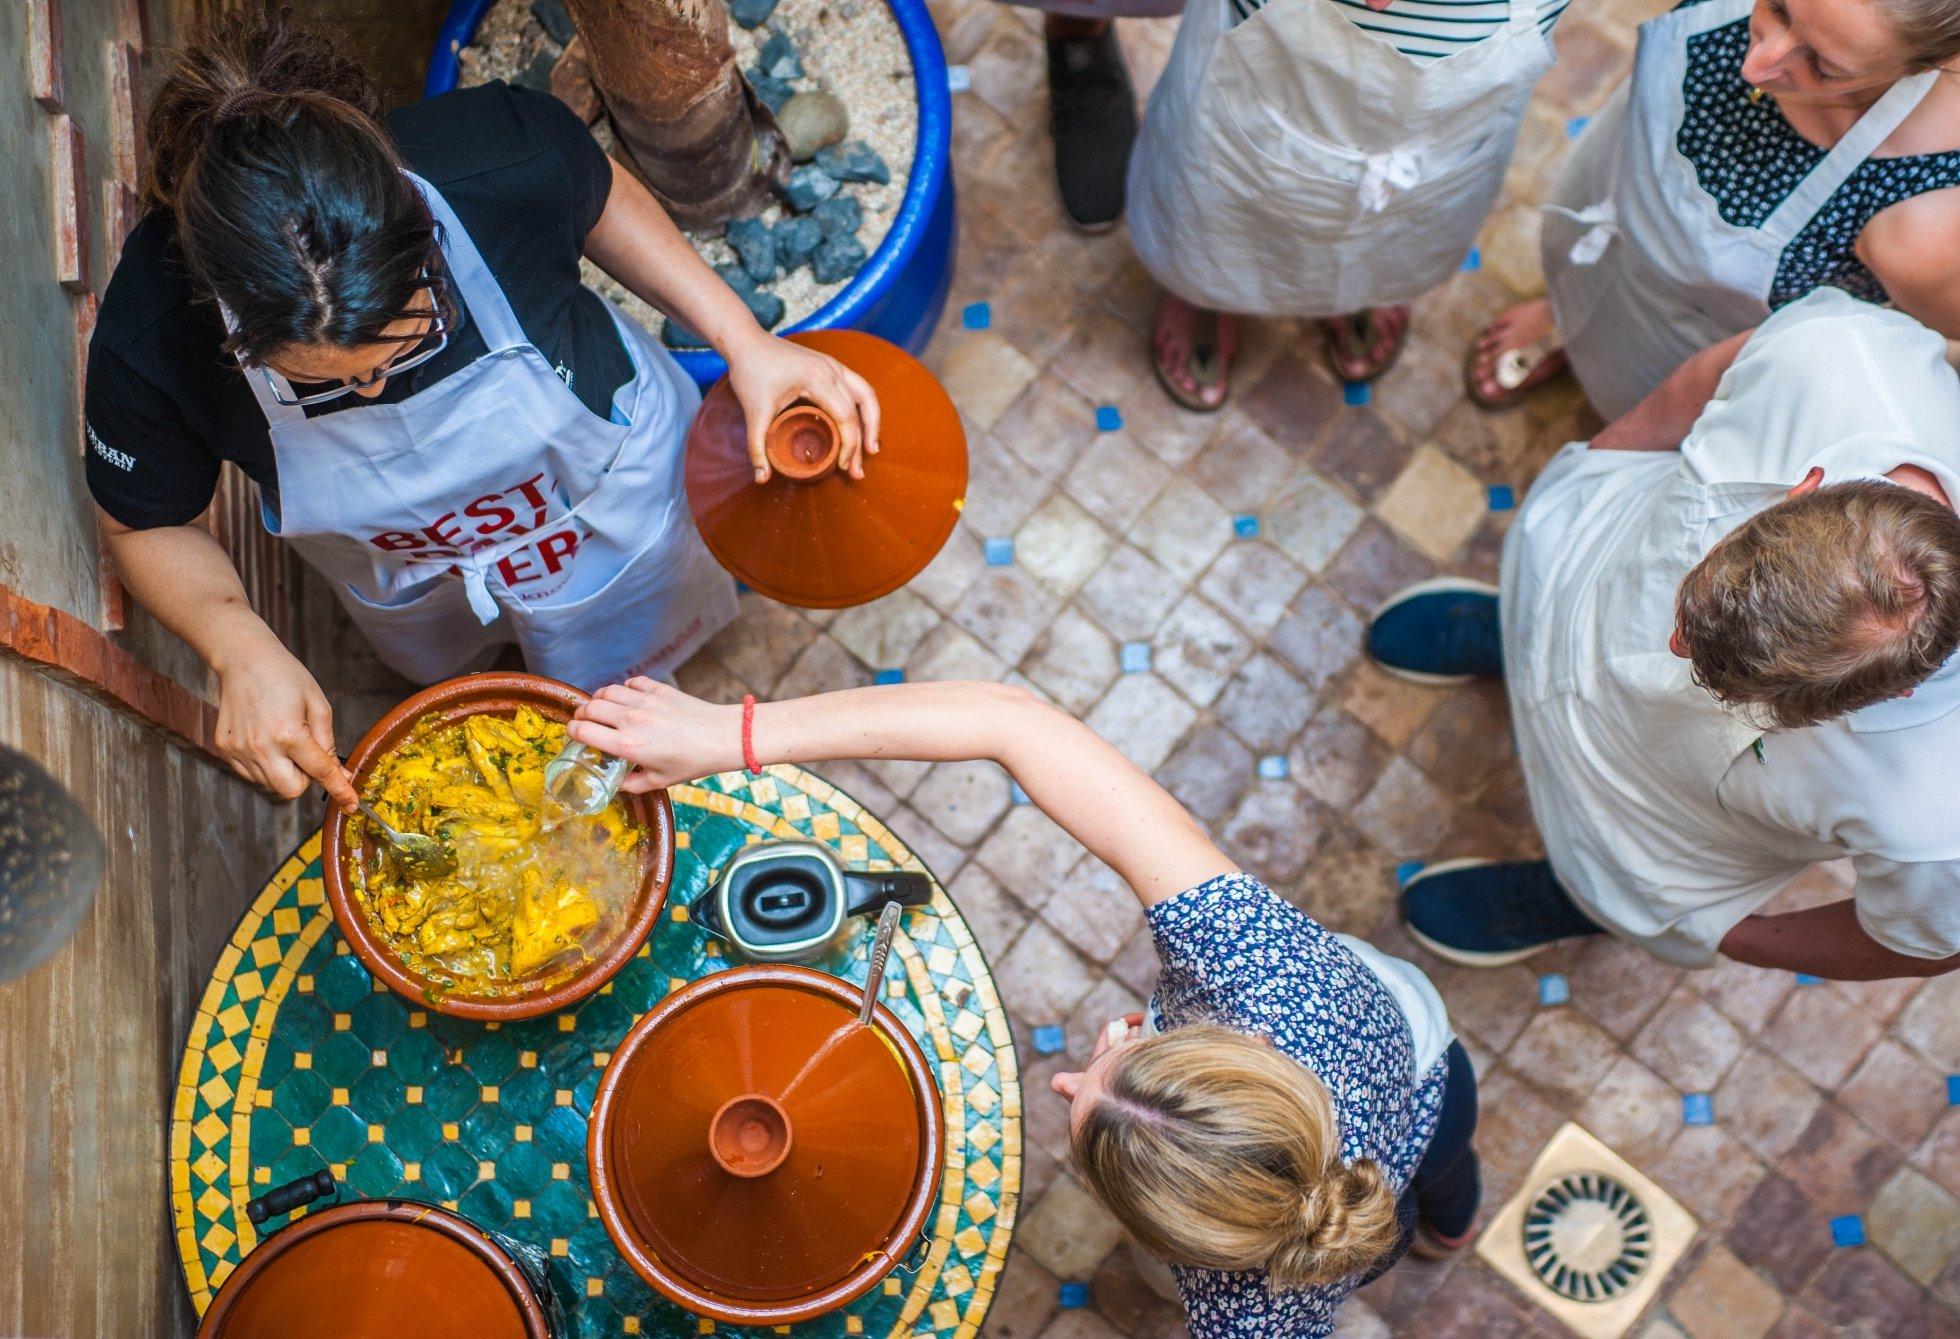 c-fakepath-urban-adventures-morocco_marrakech_tagine_cooking.jpg